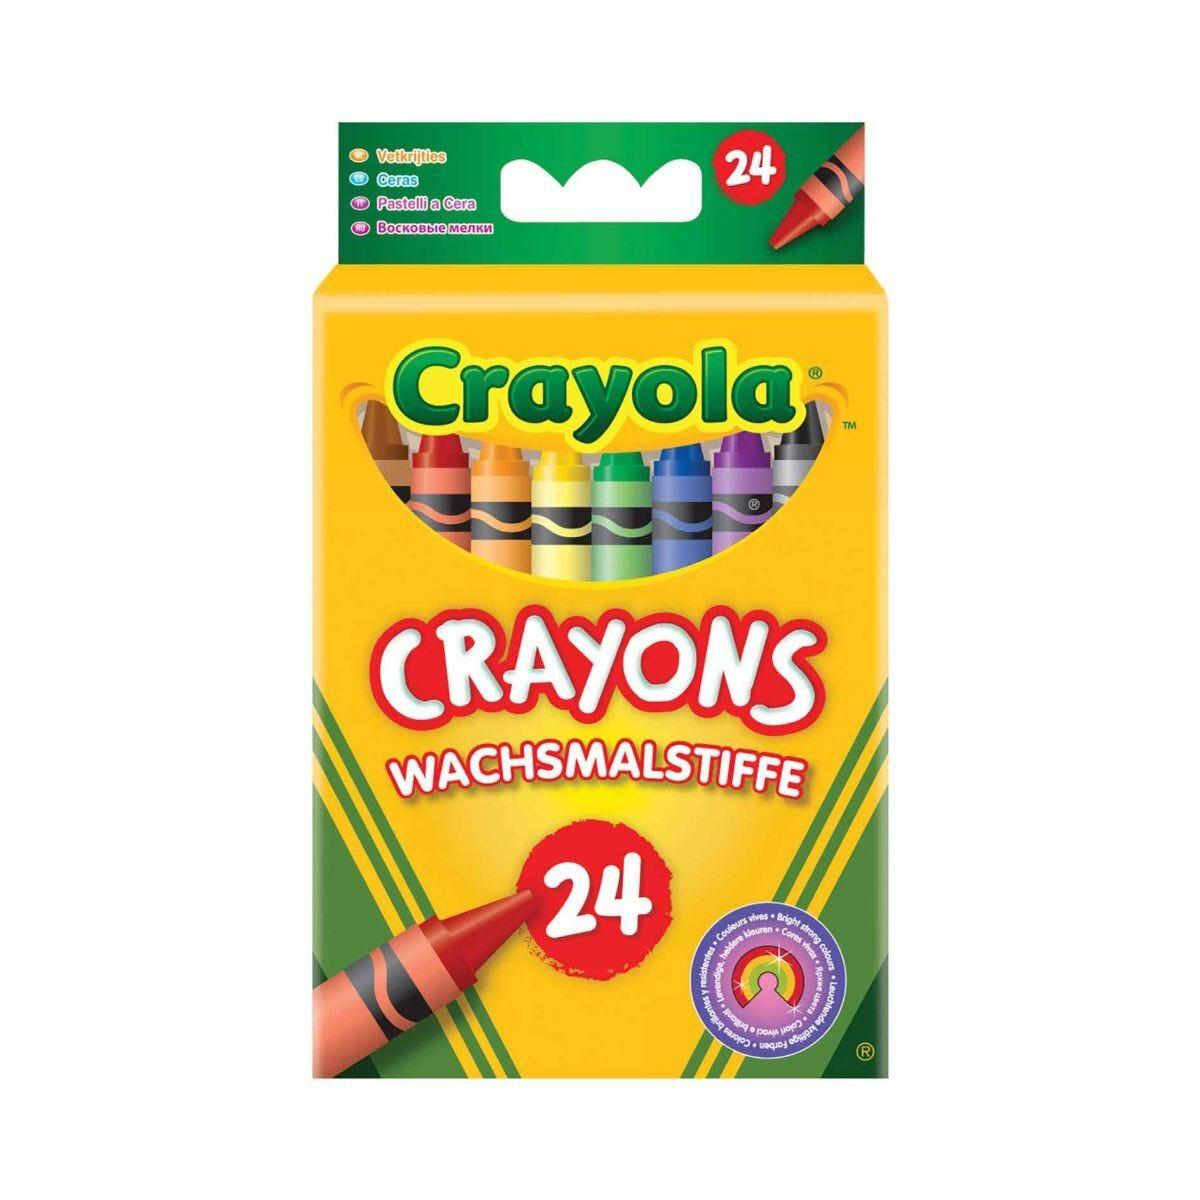 Crayola Wax Crayons Pack of 24